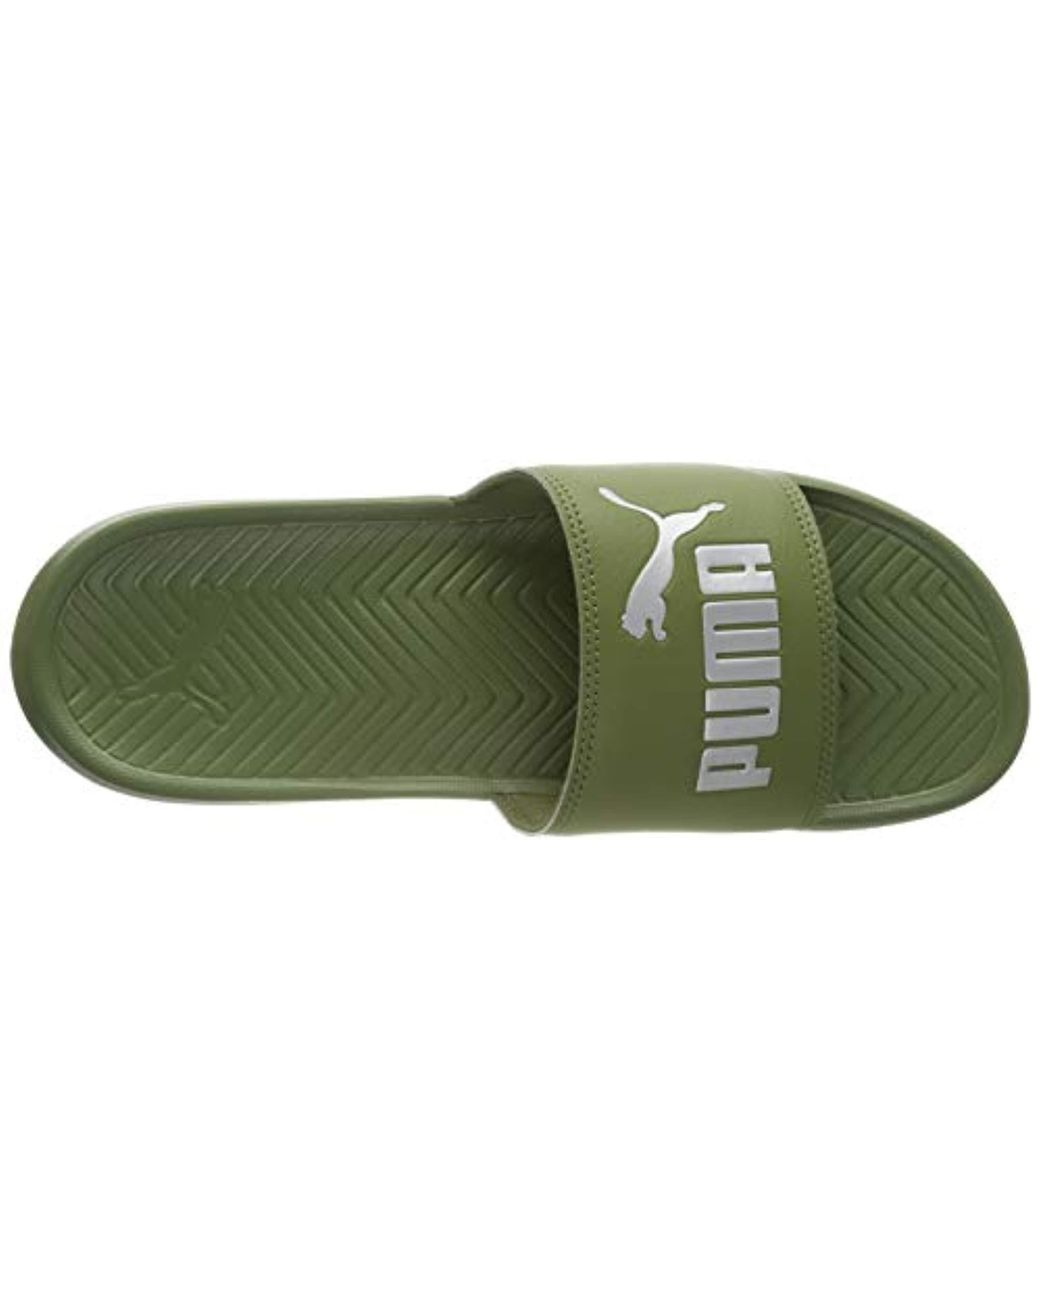 Puma Popcat Chaussures de Plage & Piscine Mixte adulte